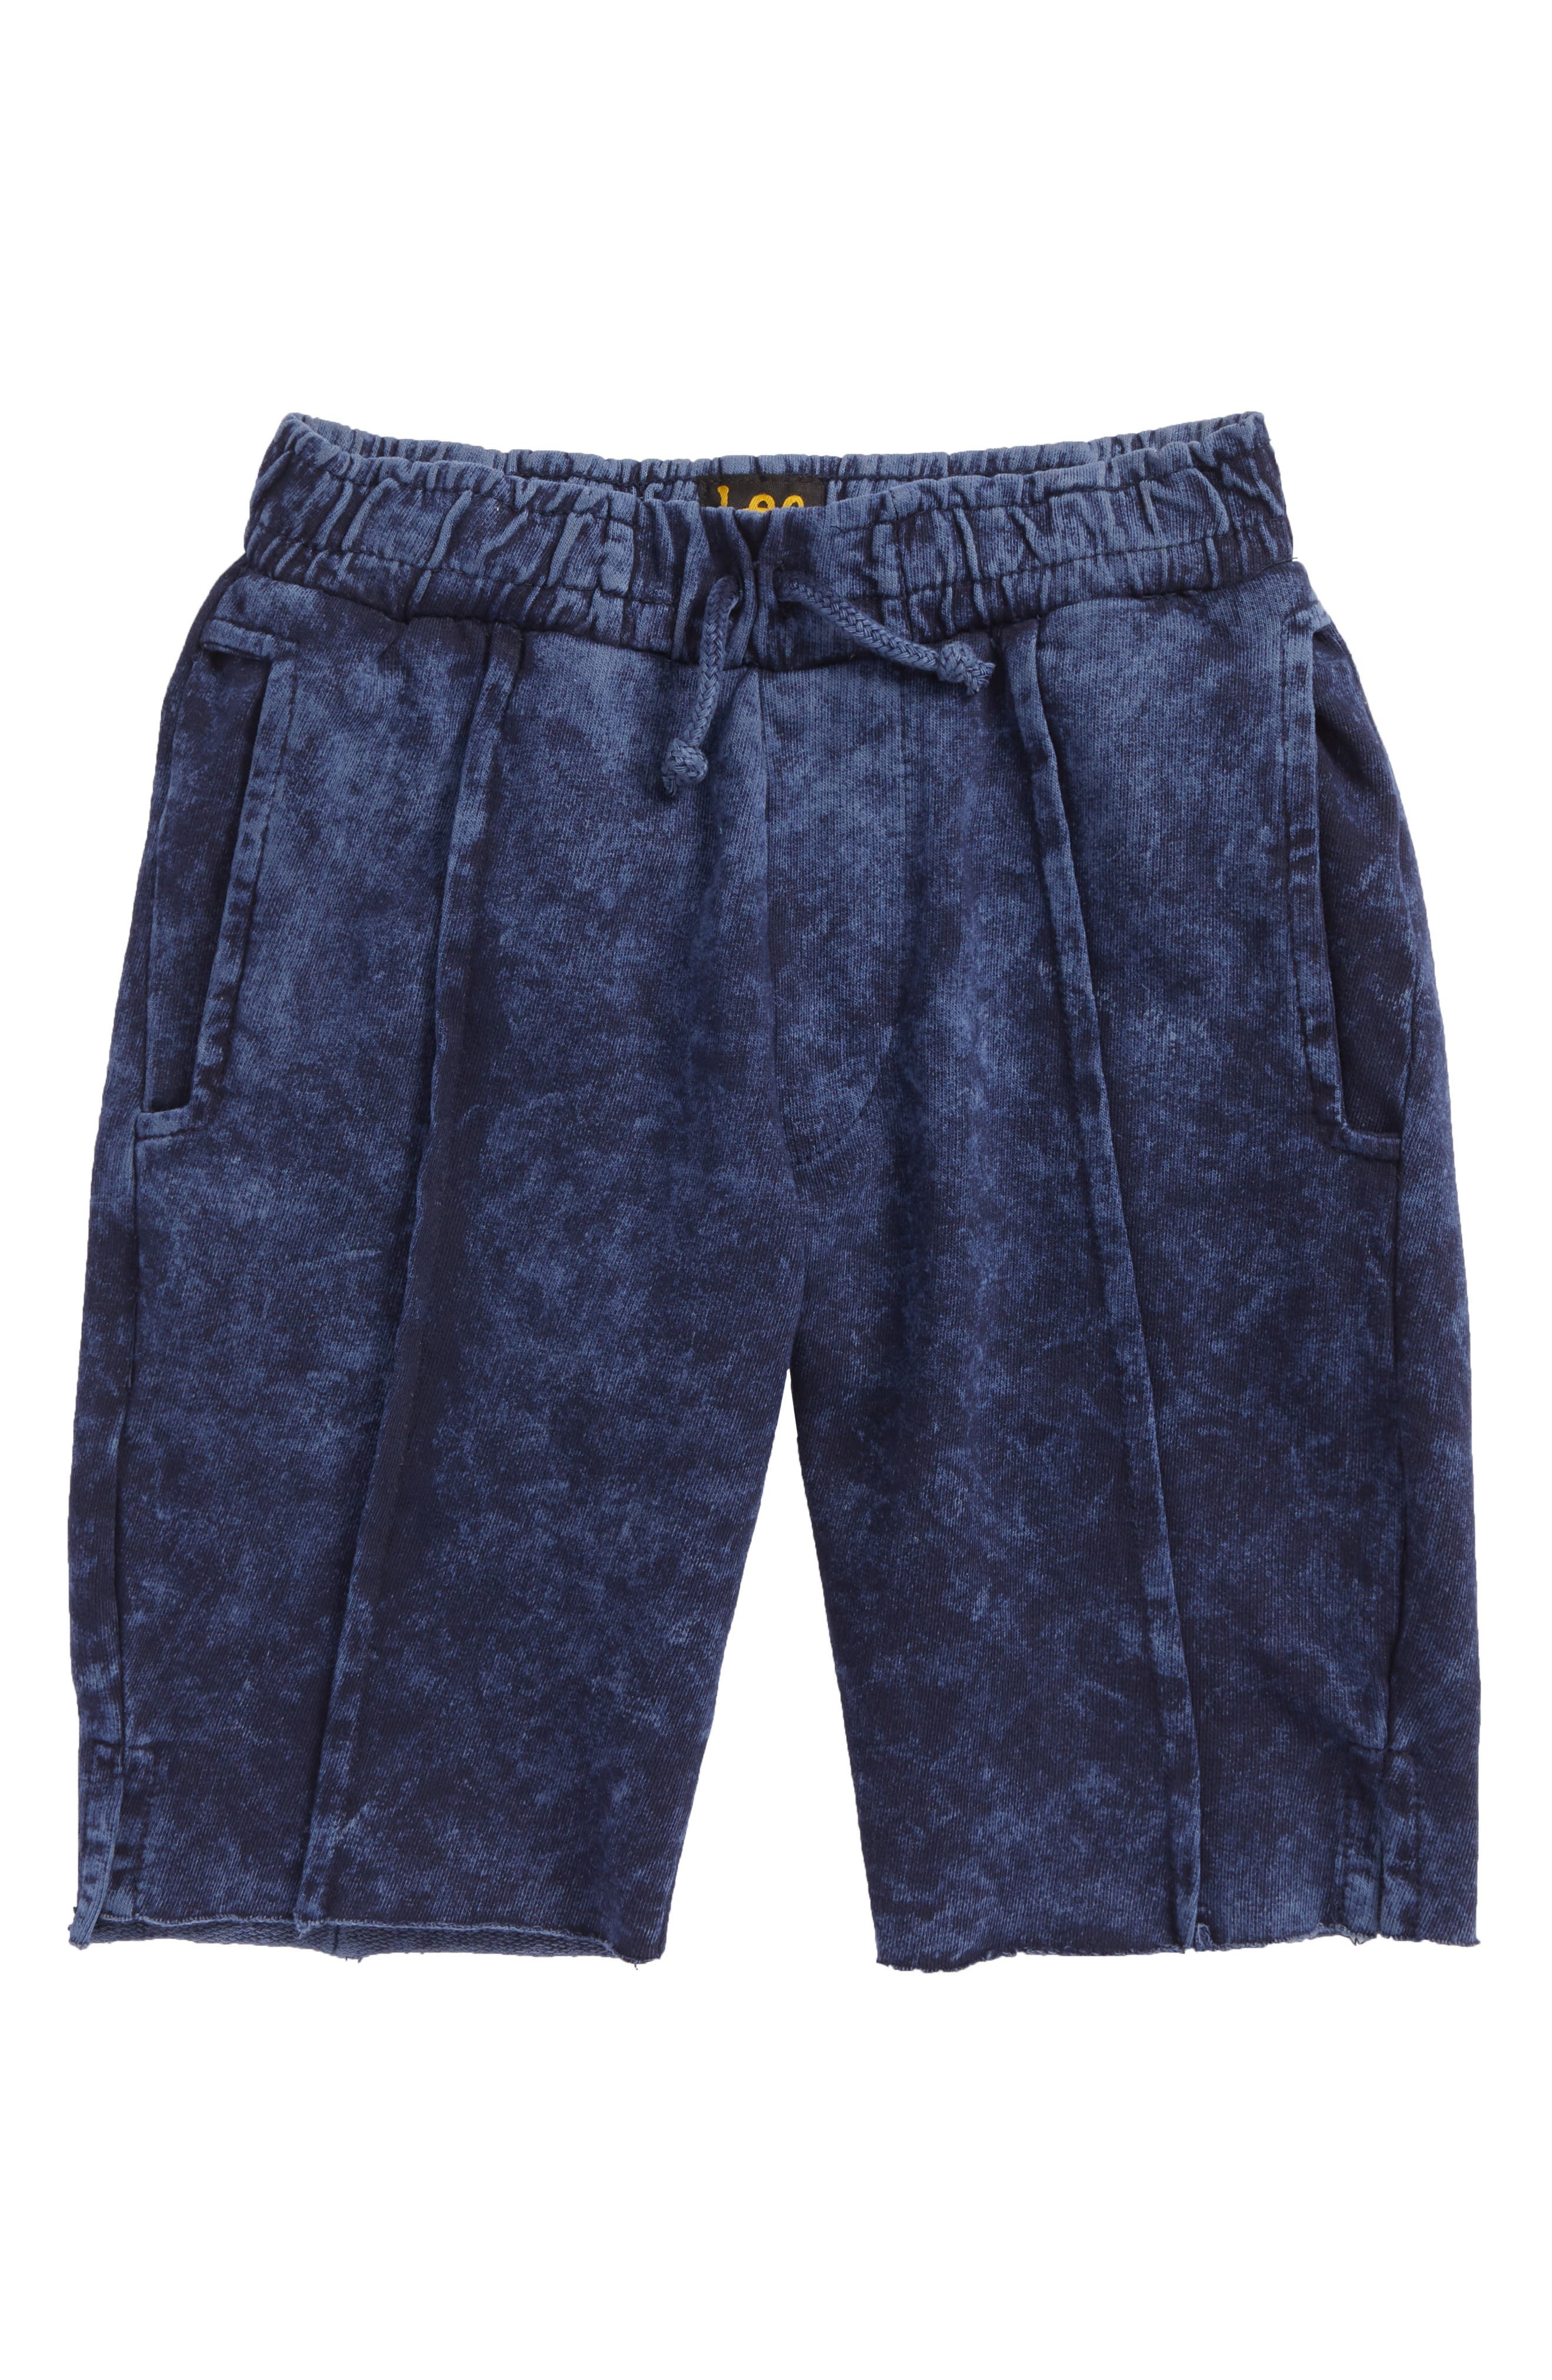 Lee Acid Wash Pull-On Shorts (Toddler Boys & Little Boys)